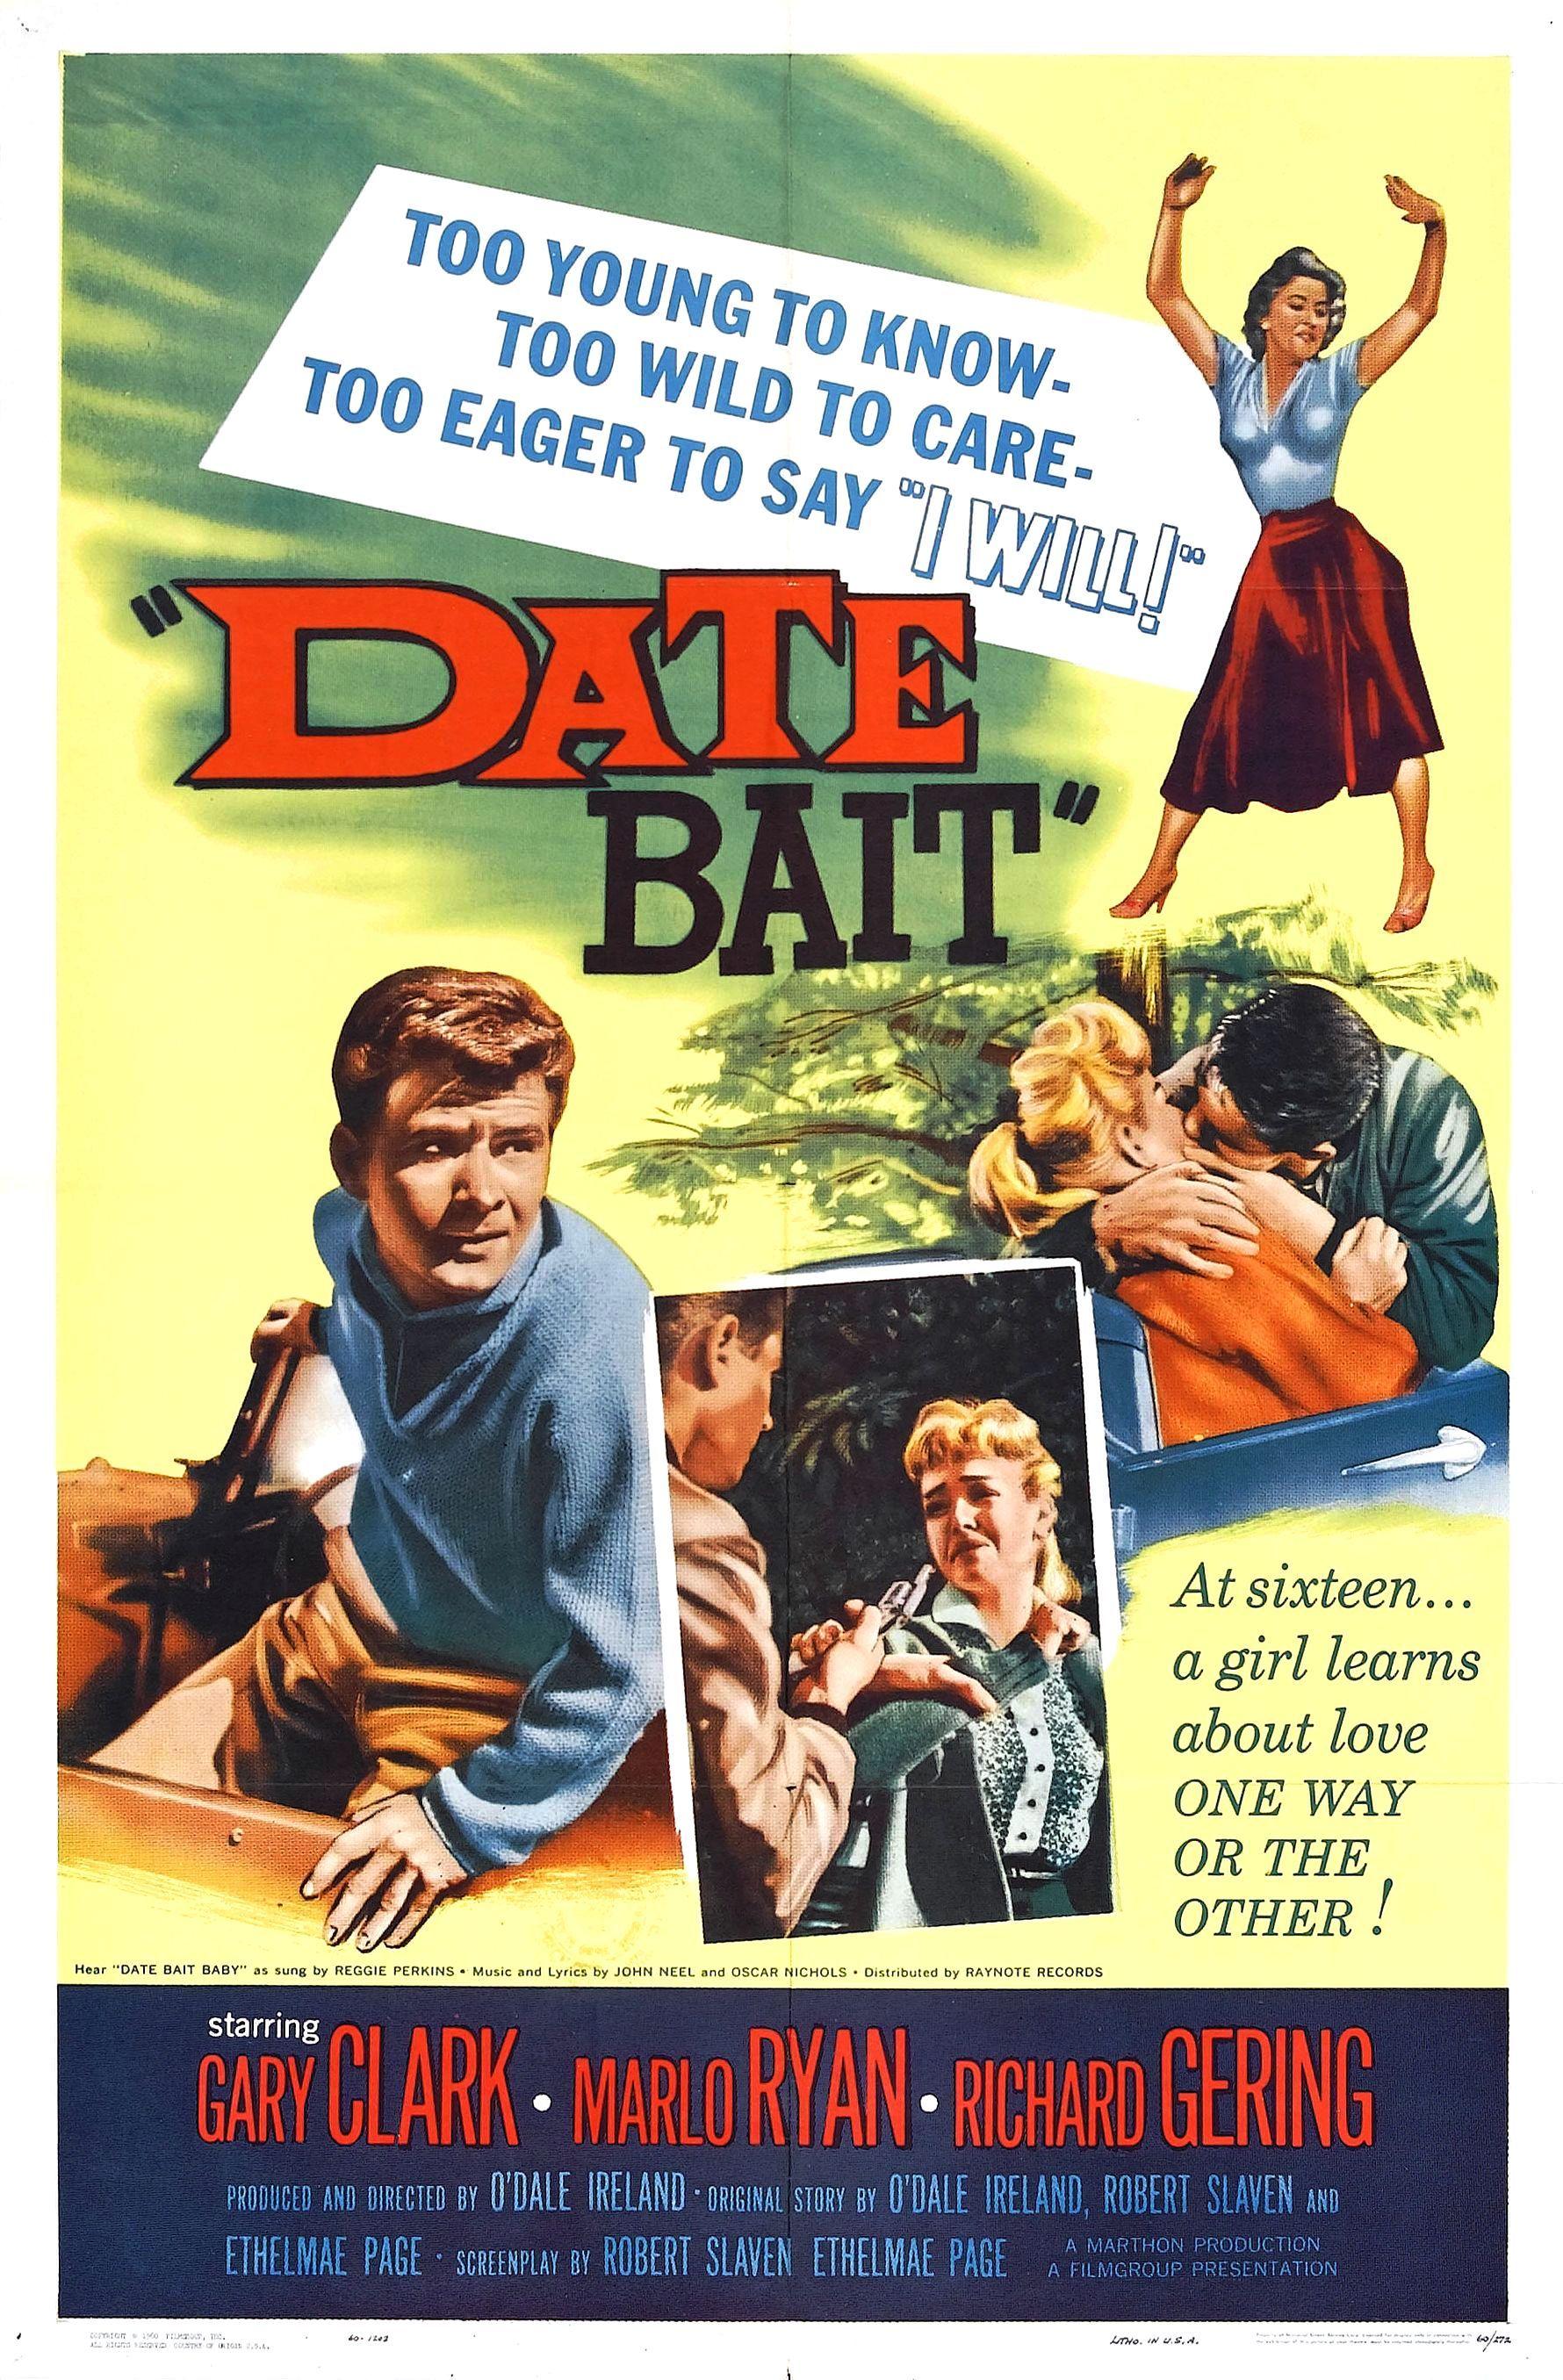 Date bait 1960 film posters vintage movie posters